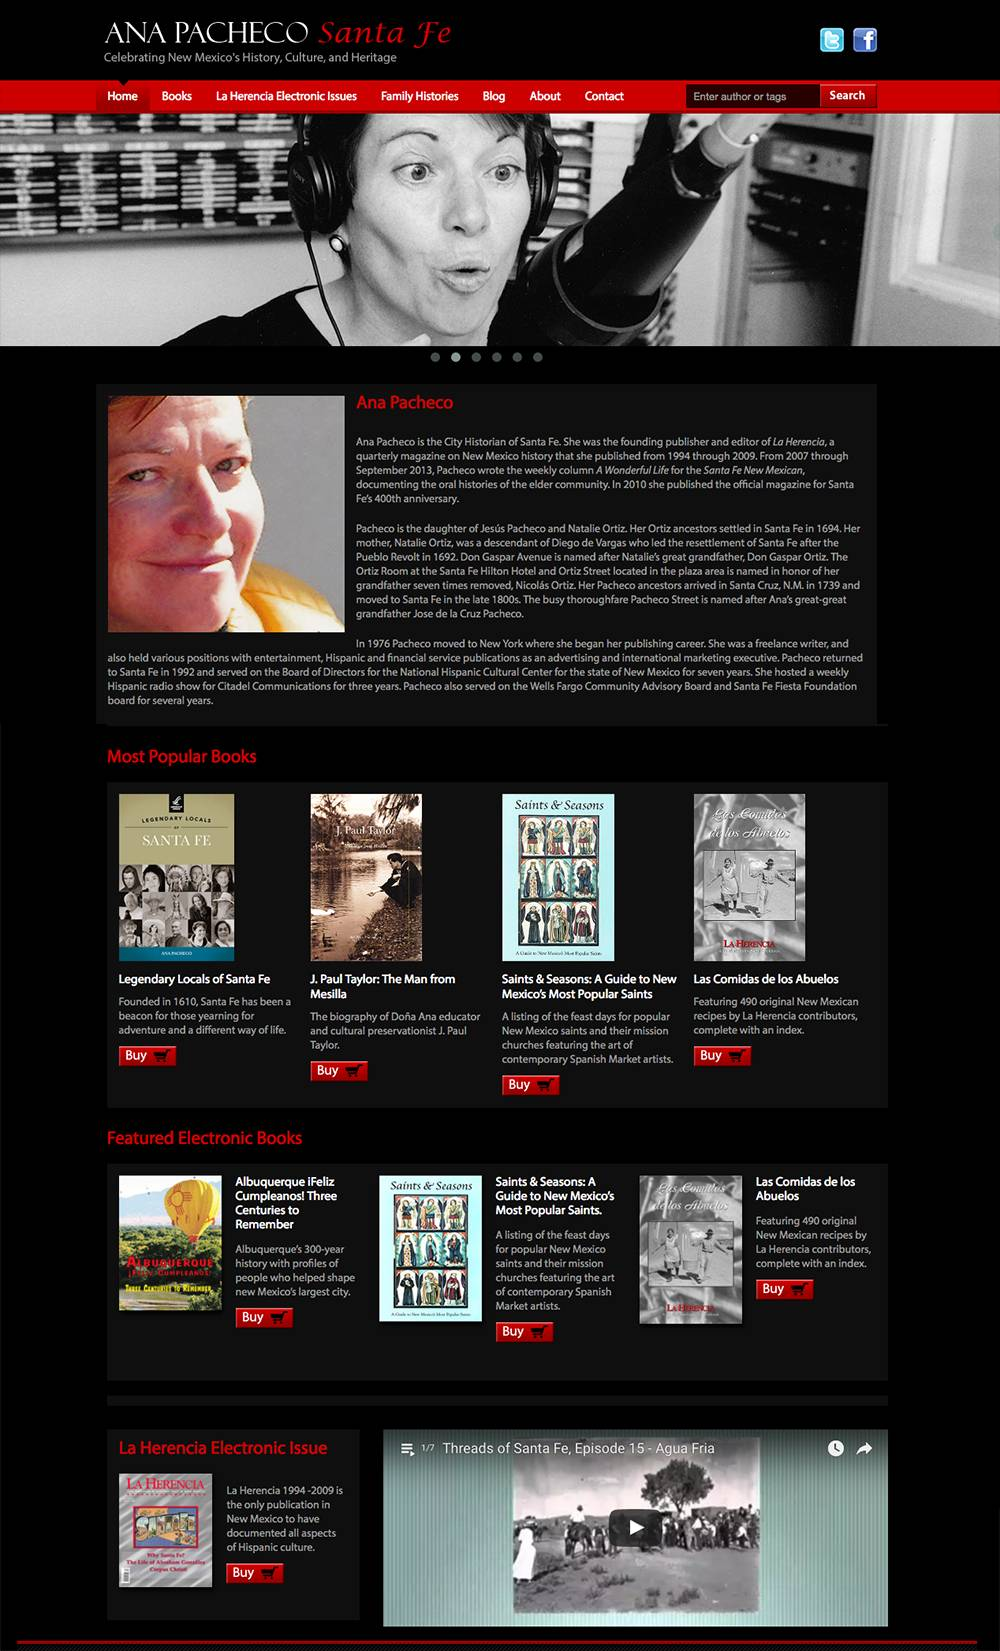 Home page for Ana Pacheco